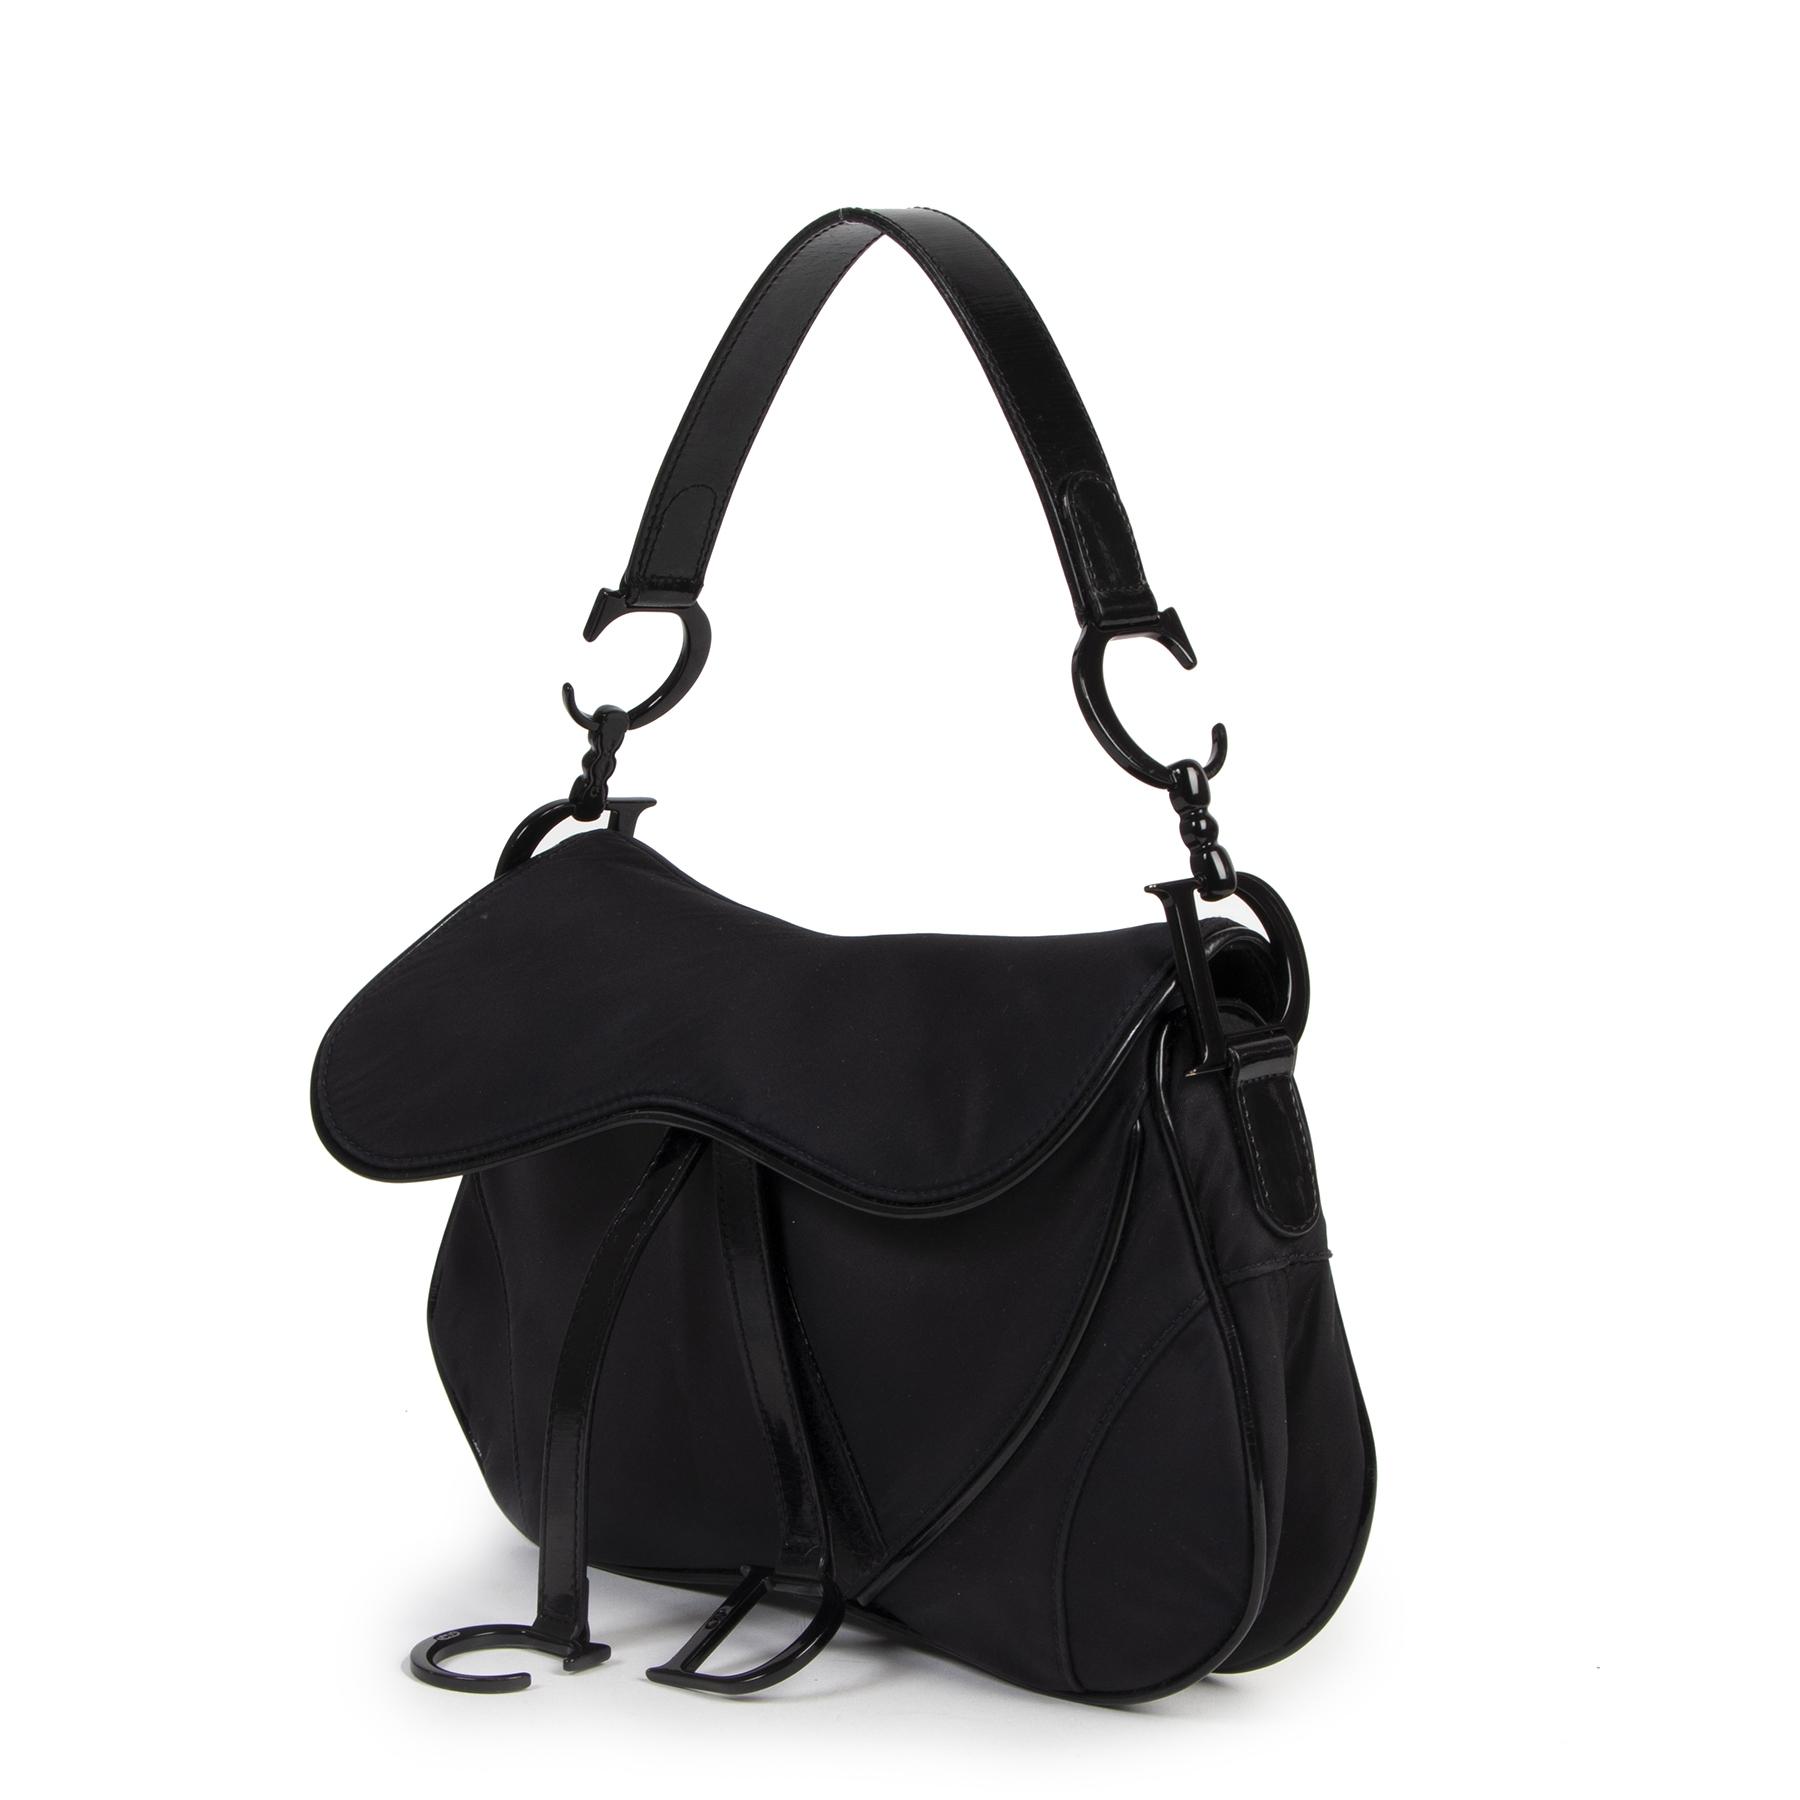 Authentic secondhand Dior Black Nylon Double Saddle Shoulder Bag designer bags luxury vintage webshop fashion safe secure online shopping